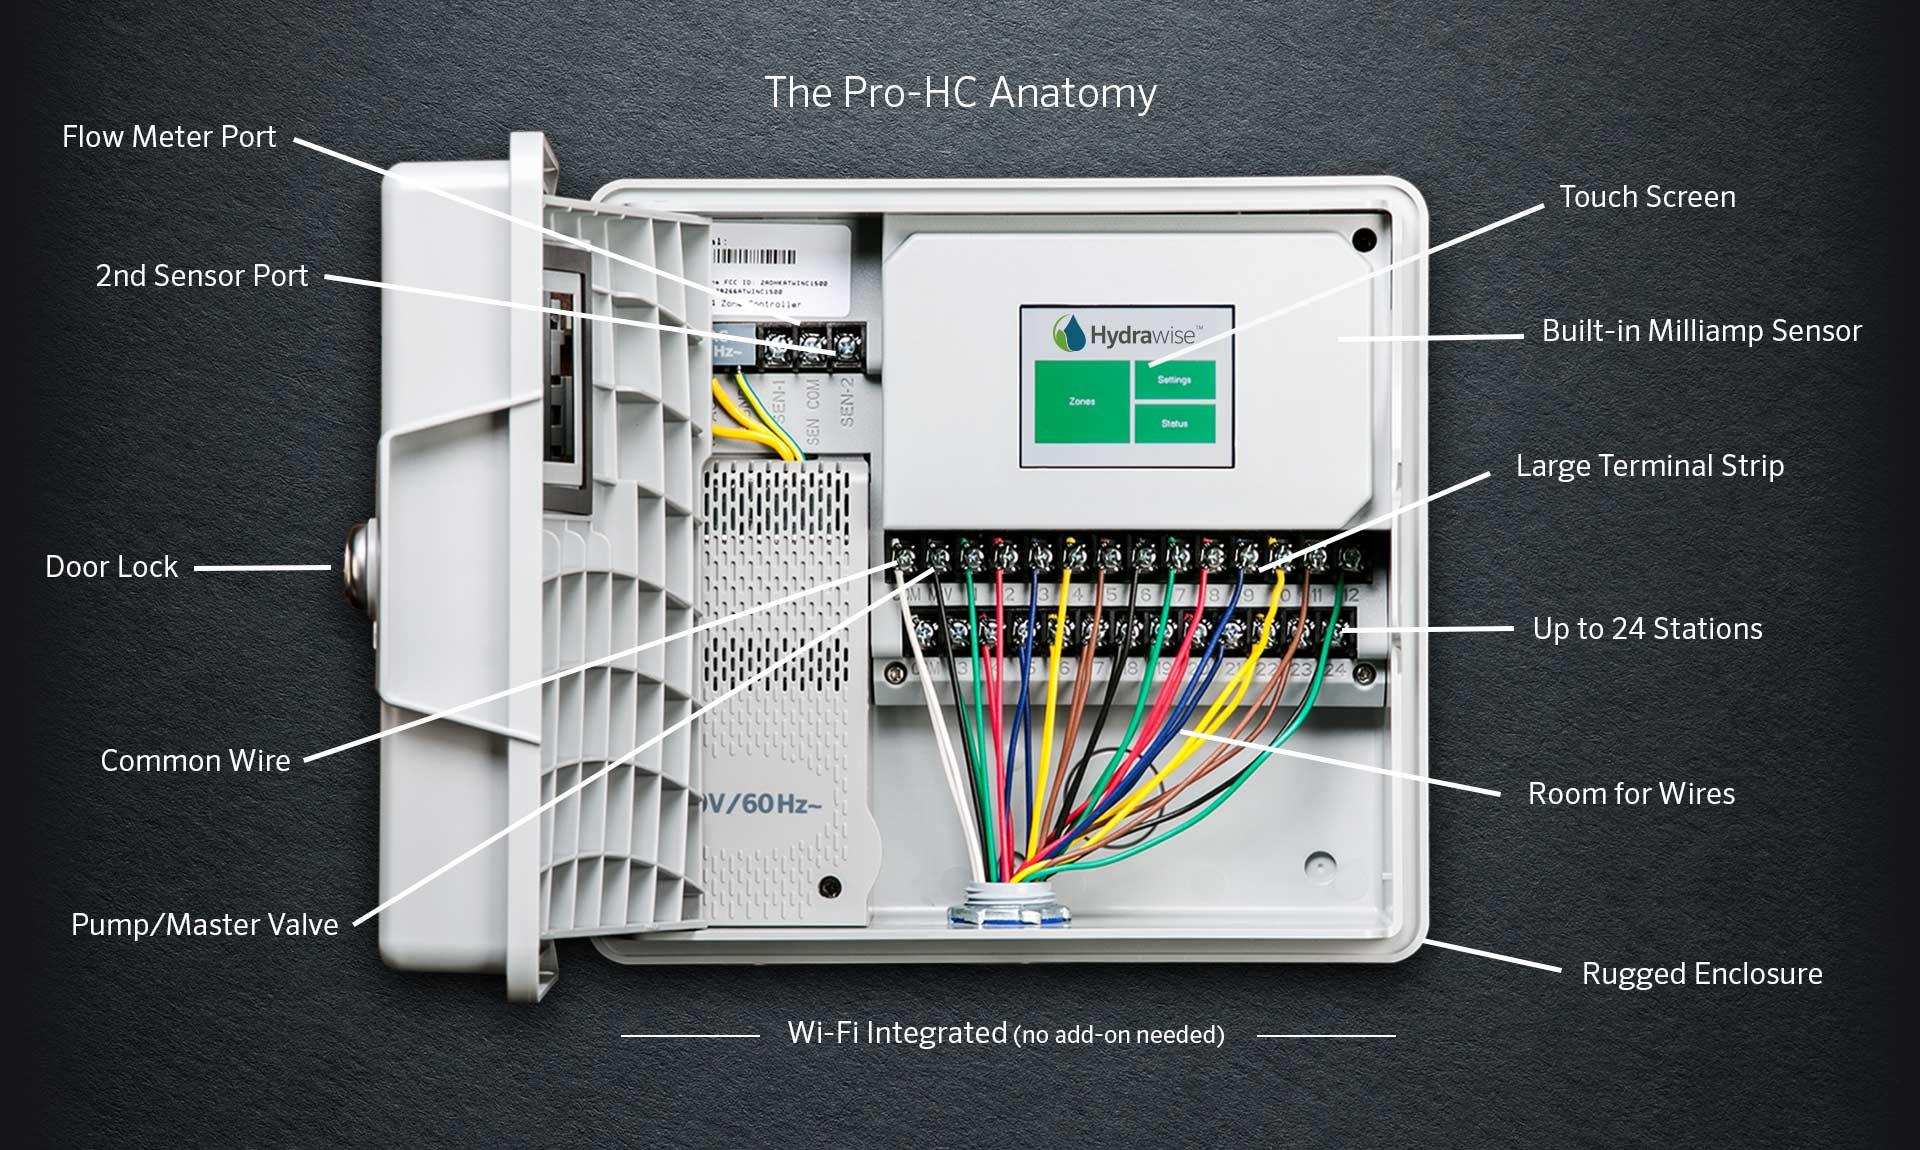 hunter pro c sprinkler system wiring diagram 2004 chevy impala bcm hc industries